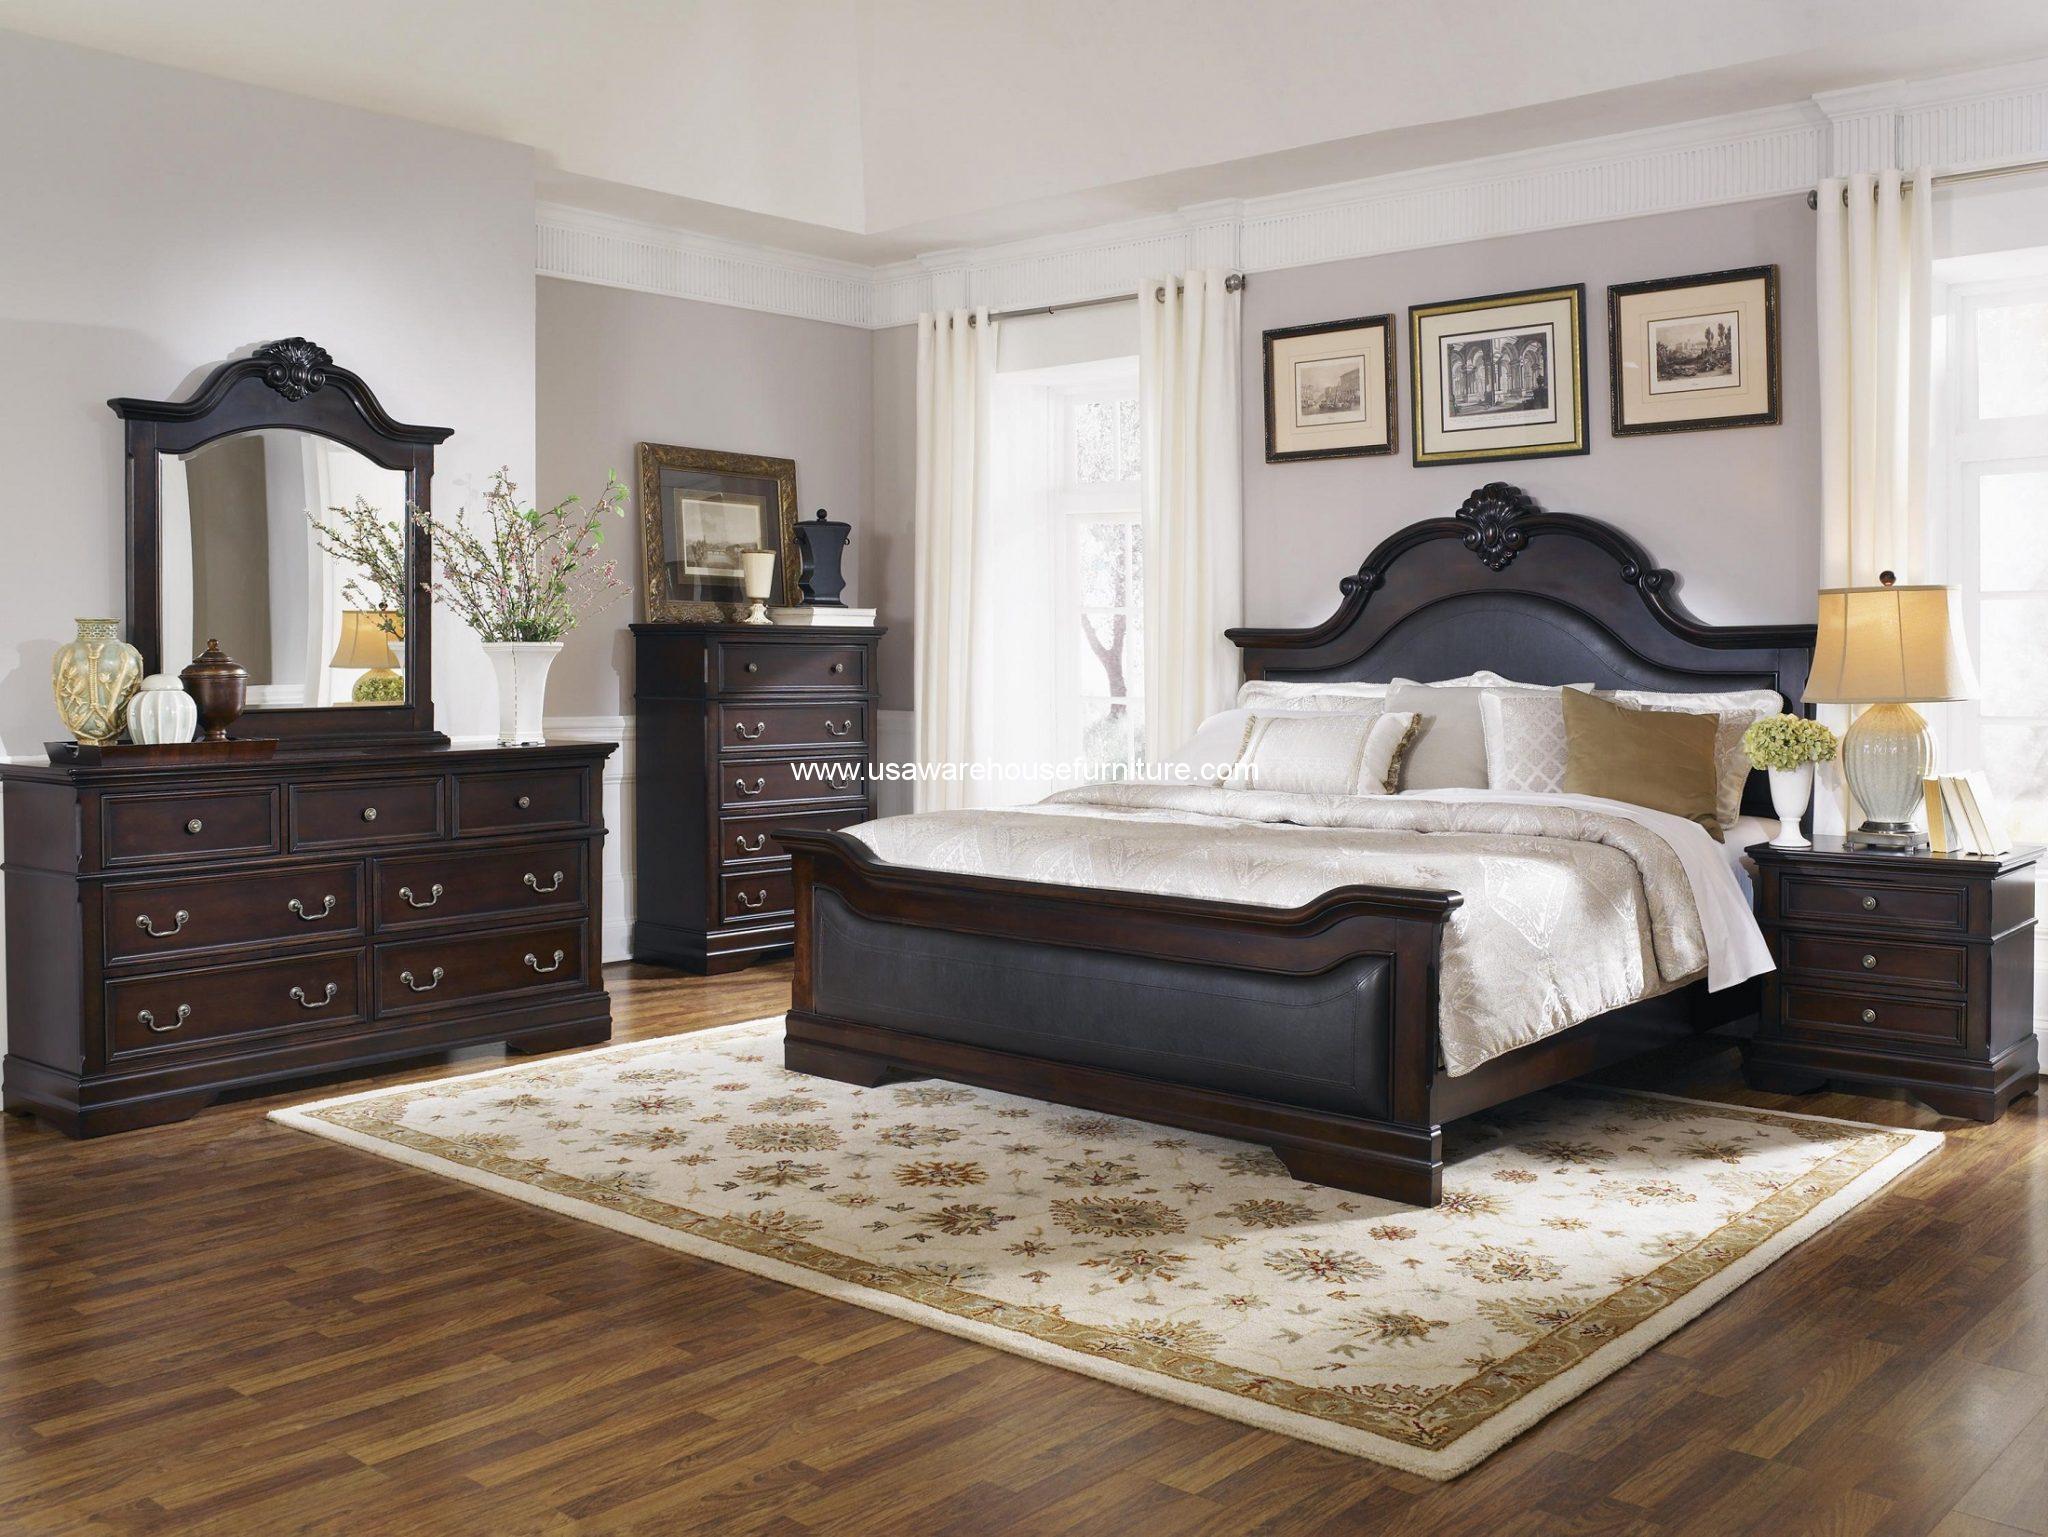 Cambridge Upholstered Panel Bedroom Set 203191 Coaster Furniture Usa Warehouse Furniture